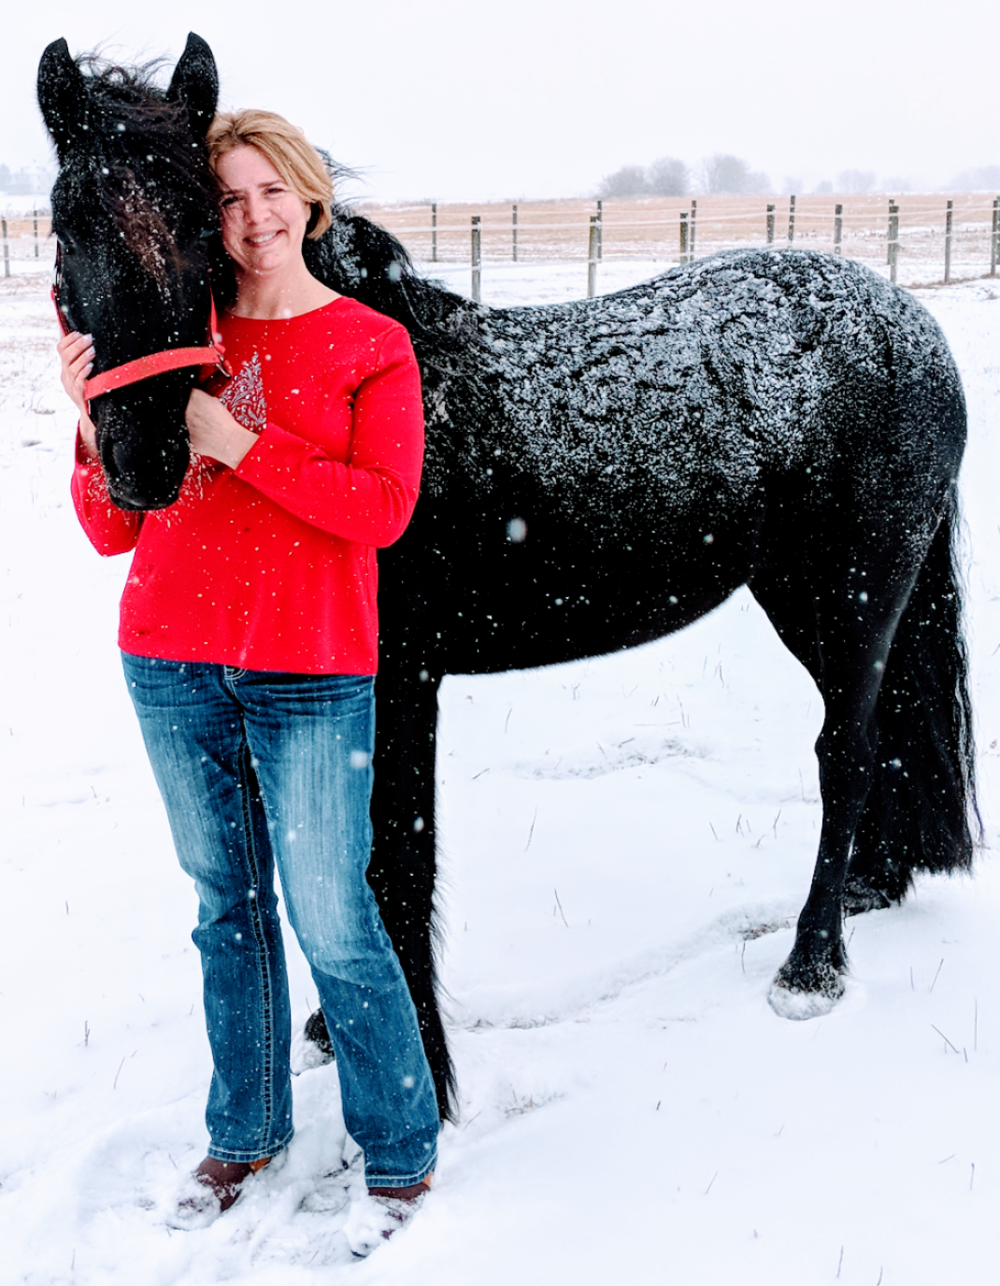 2011 partbred mare  Raspotnik Pine Raven  with owner Jennifer Bott Langguth